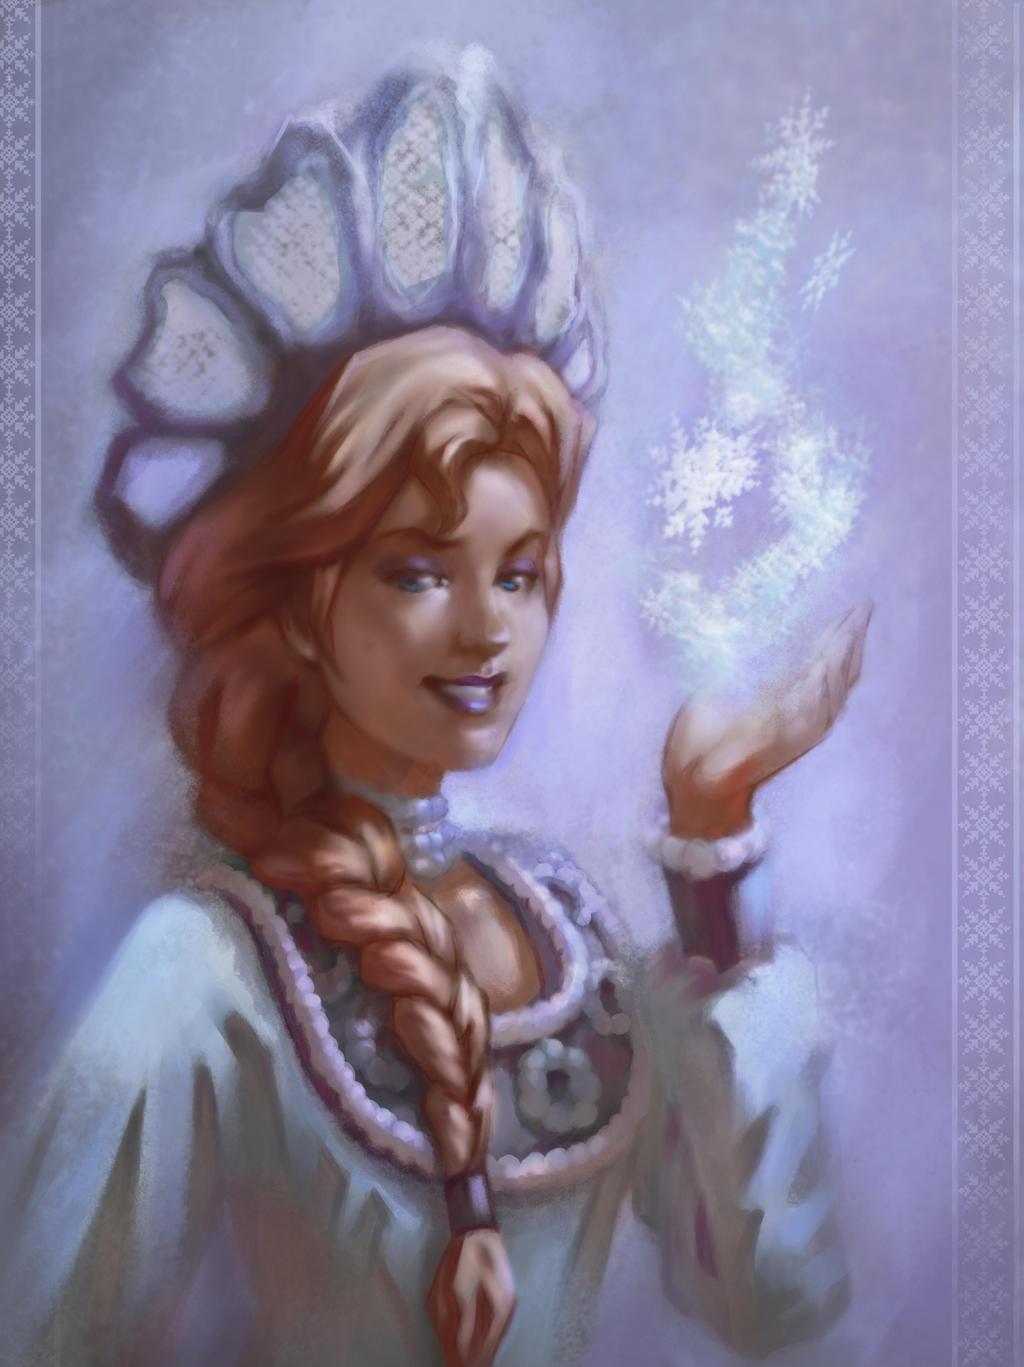 Slavic Elsa by Rocklaw